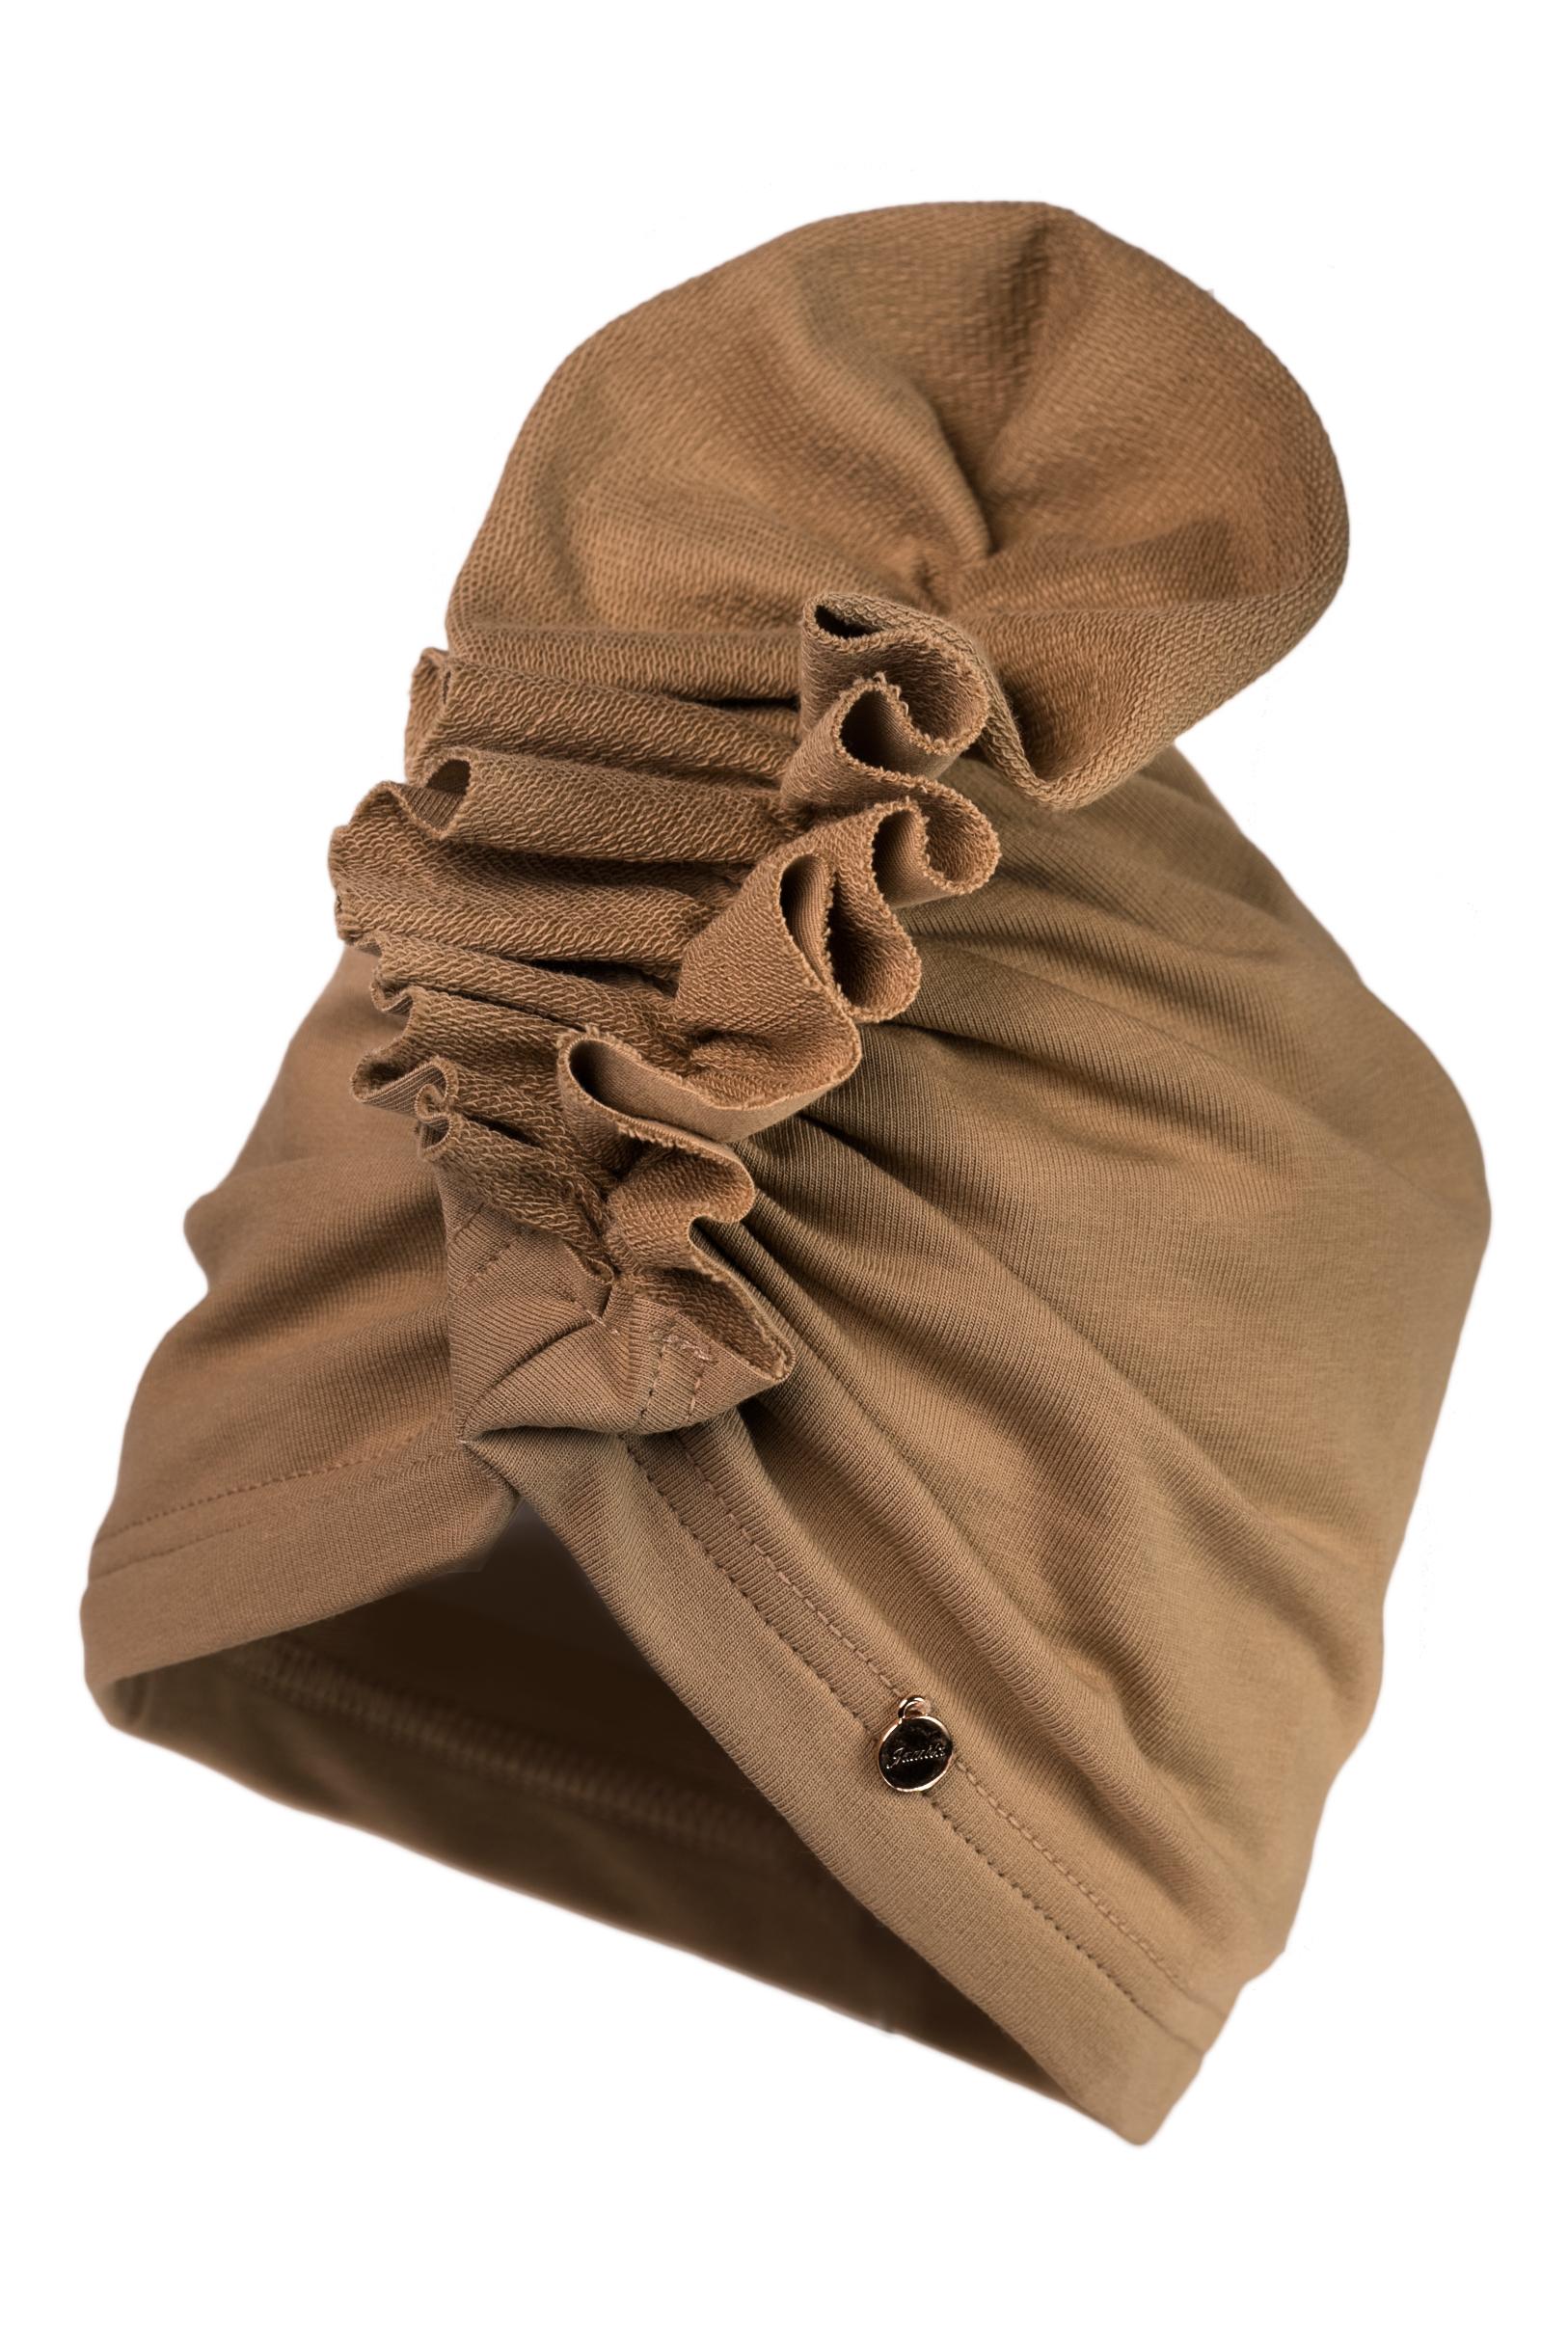 LANDONA turban 2